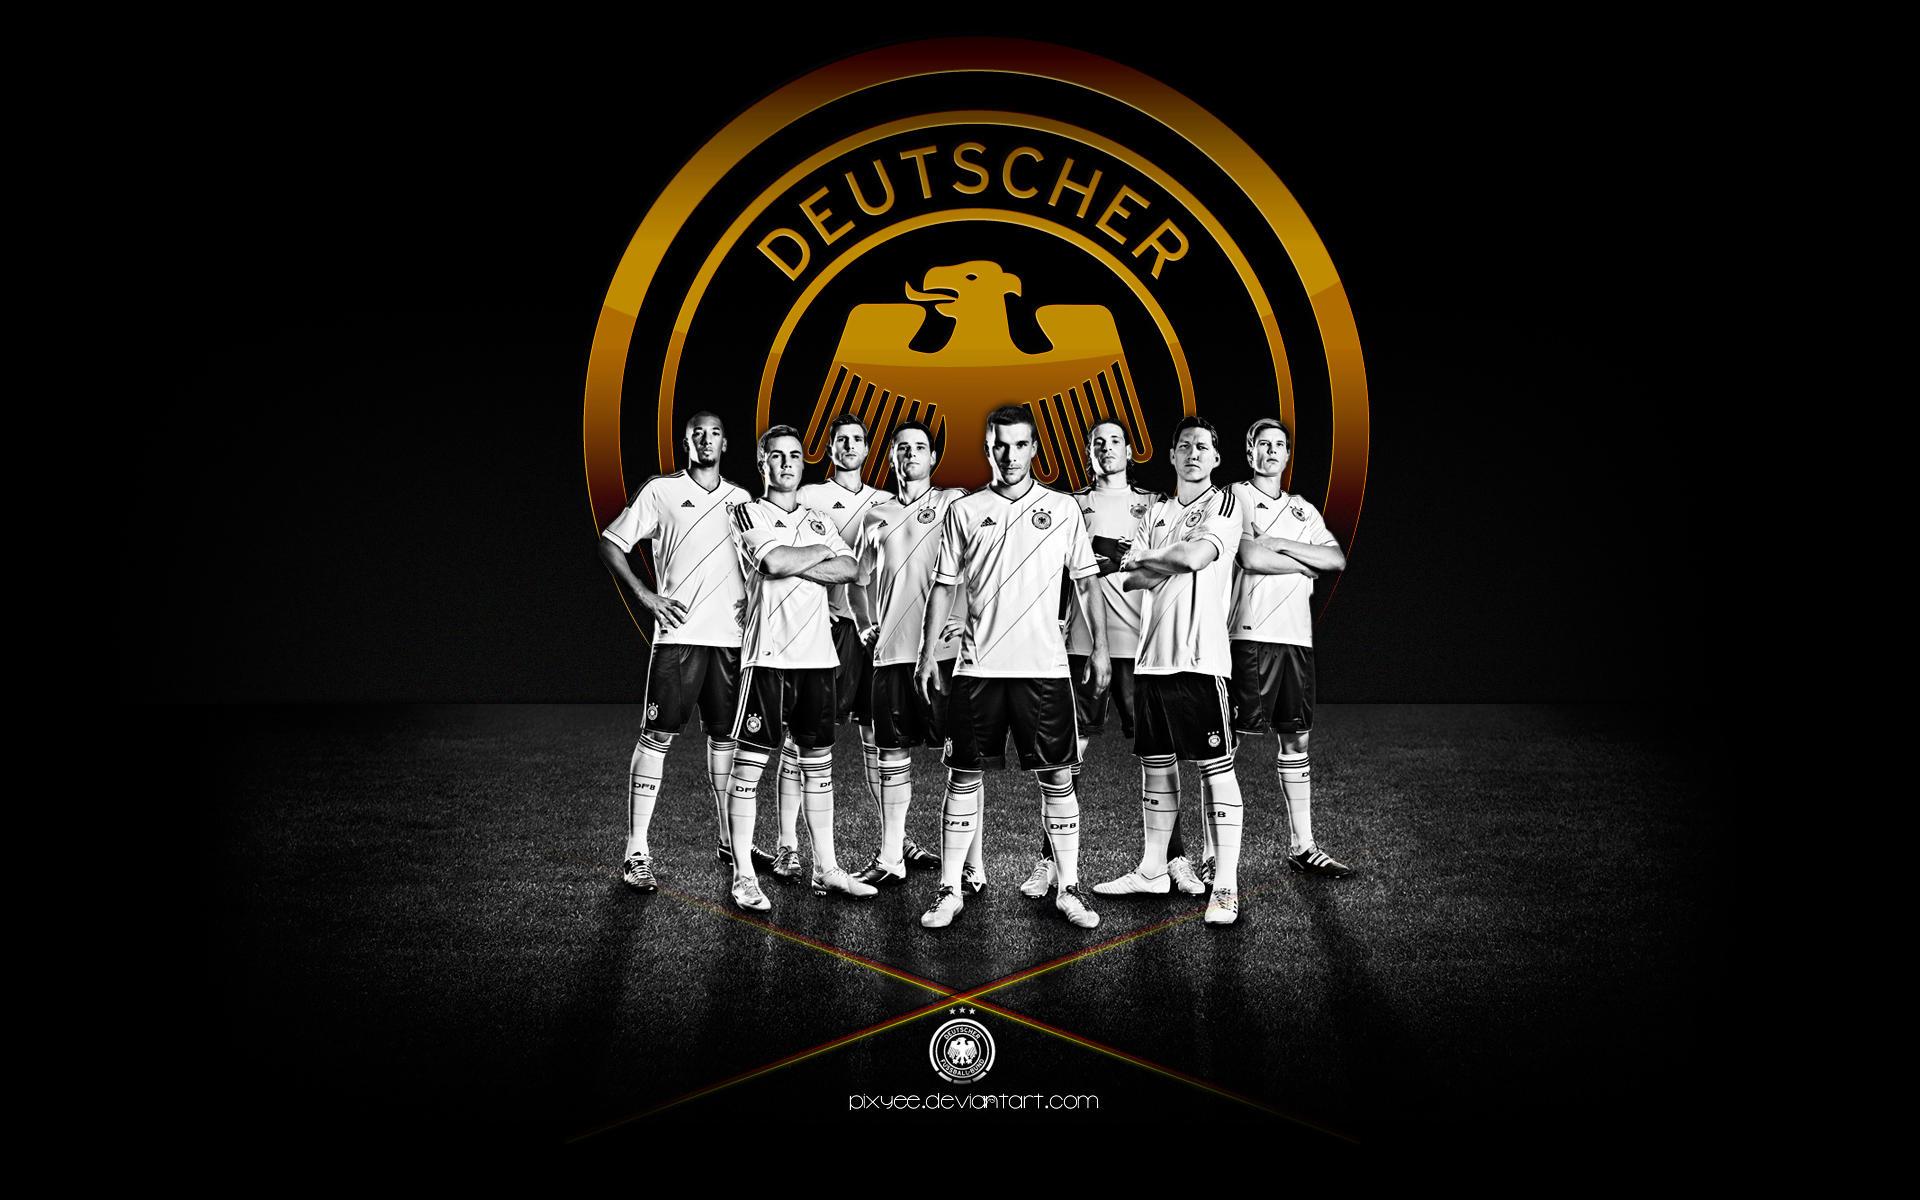 deutscher fussball bund 2012 wallpaper germany by pixyee. Black Bedroom Furniture Sets. Home Design Ideas